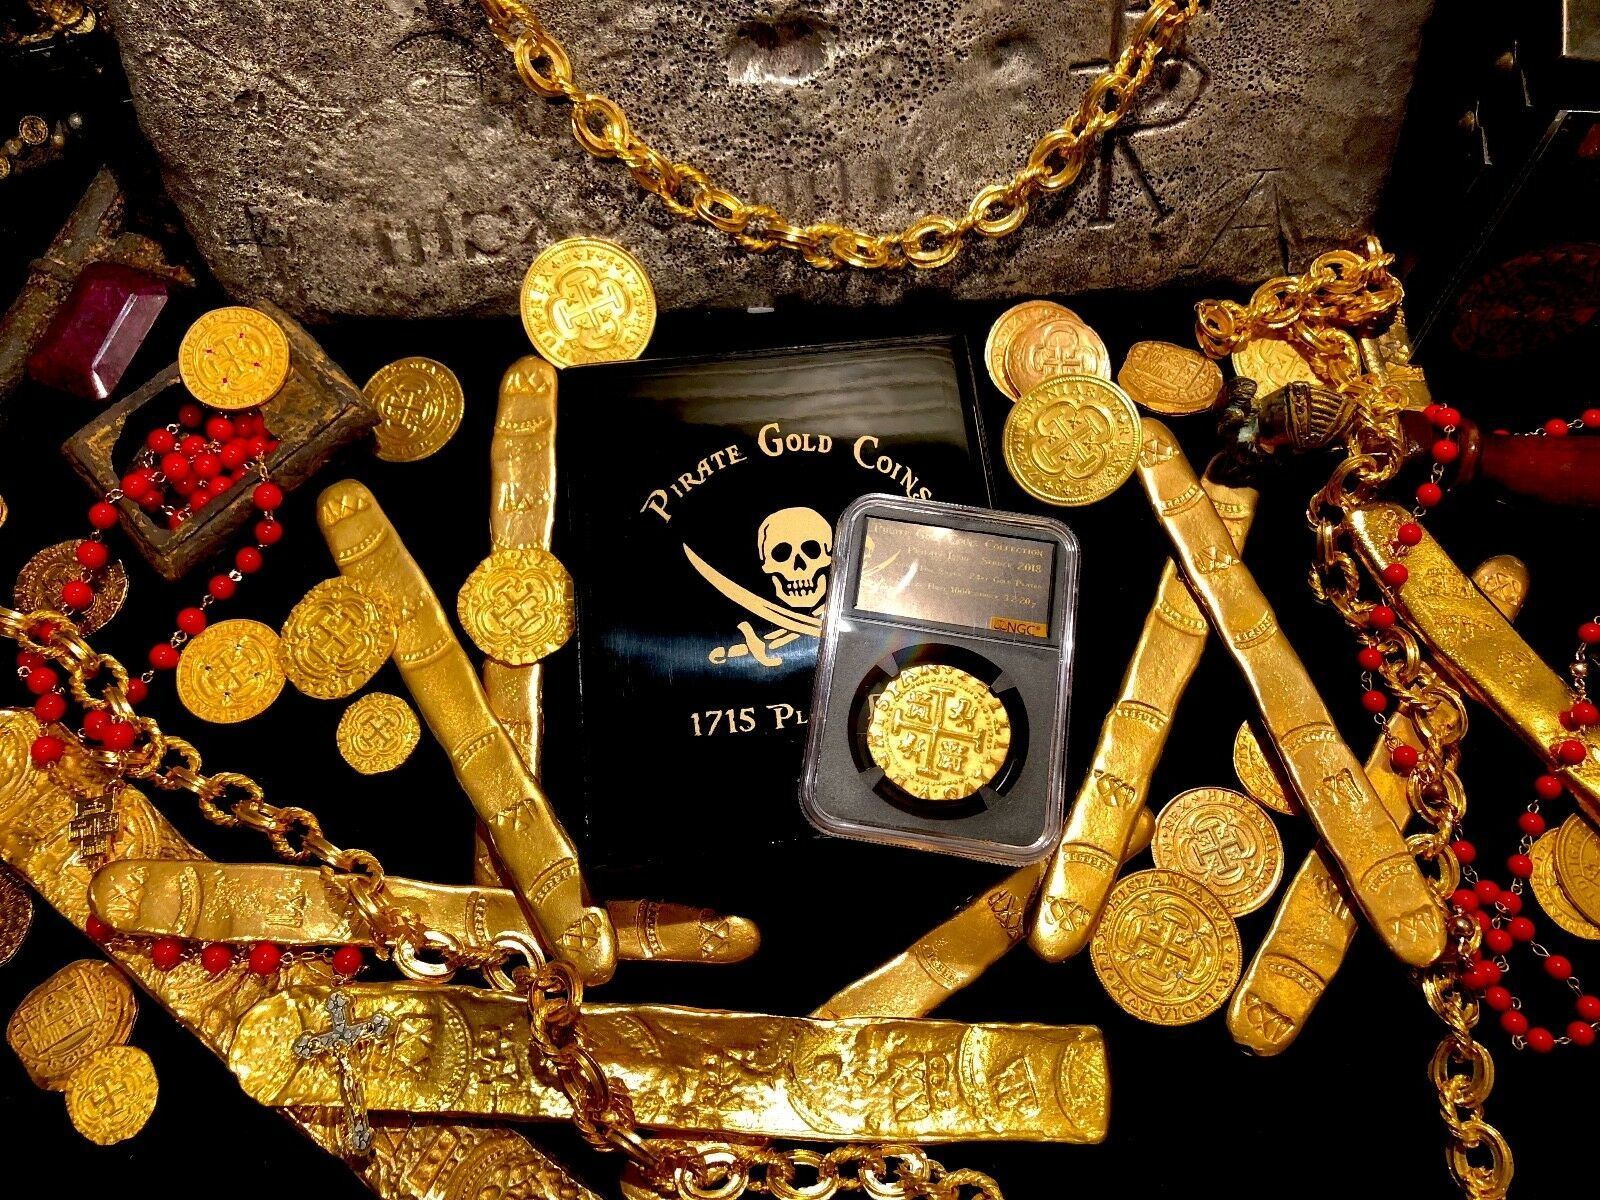 PERU 1708 8 ESCUDOS NGC GOLD PLT 1715 SHIPWRECK PIRATE GOLD COINS  TREASRUE